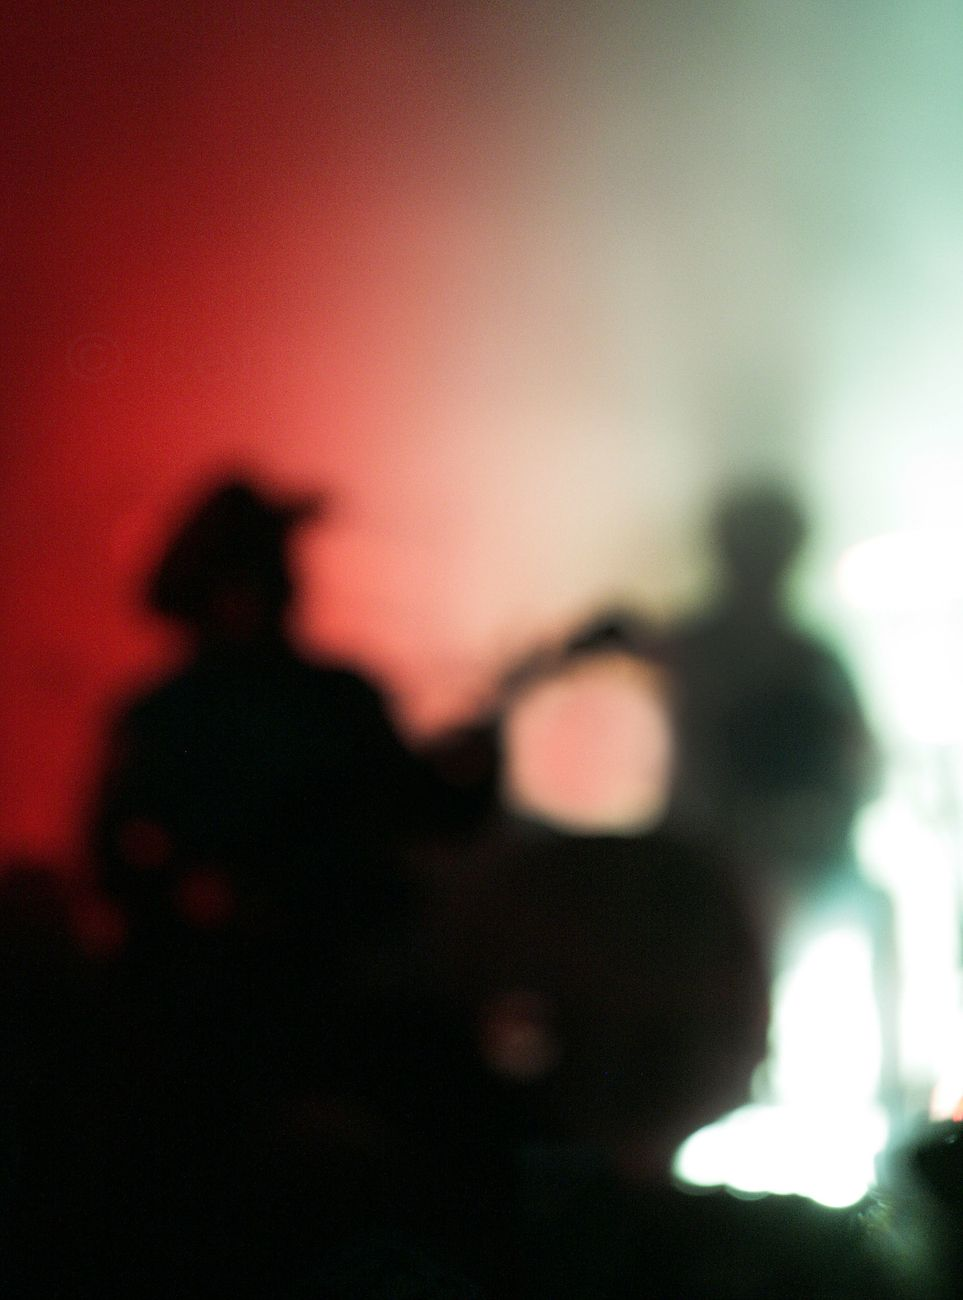 20190816-music-tednugent-09